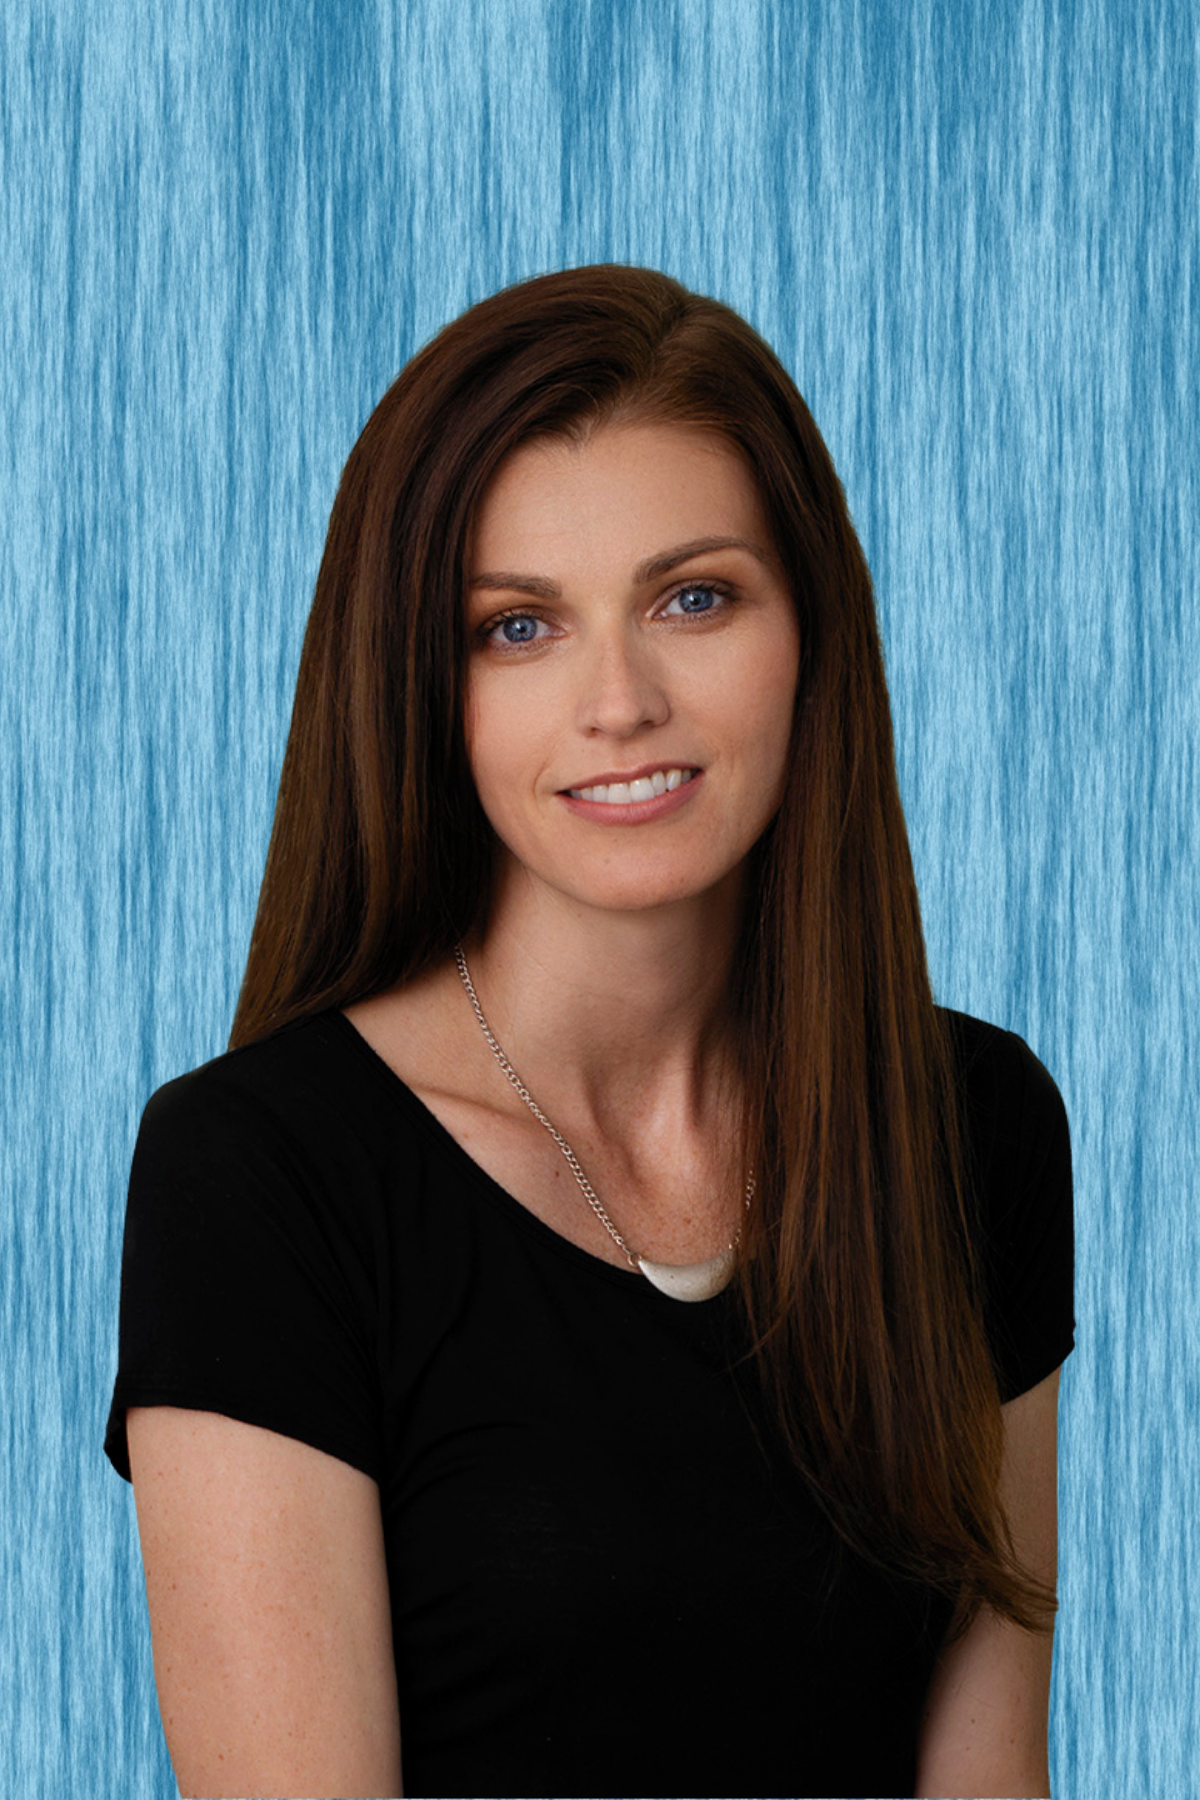 Susan Milner broker of Florida Future Realty